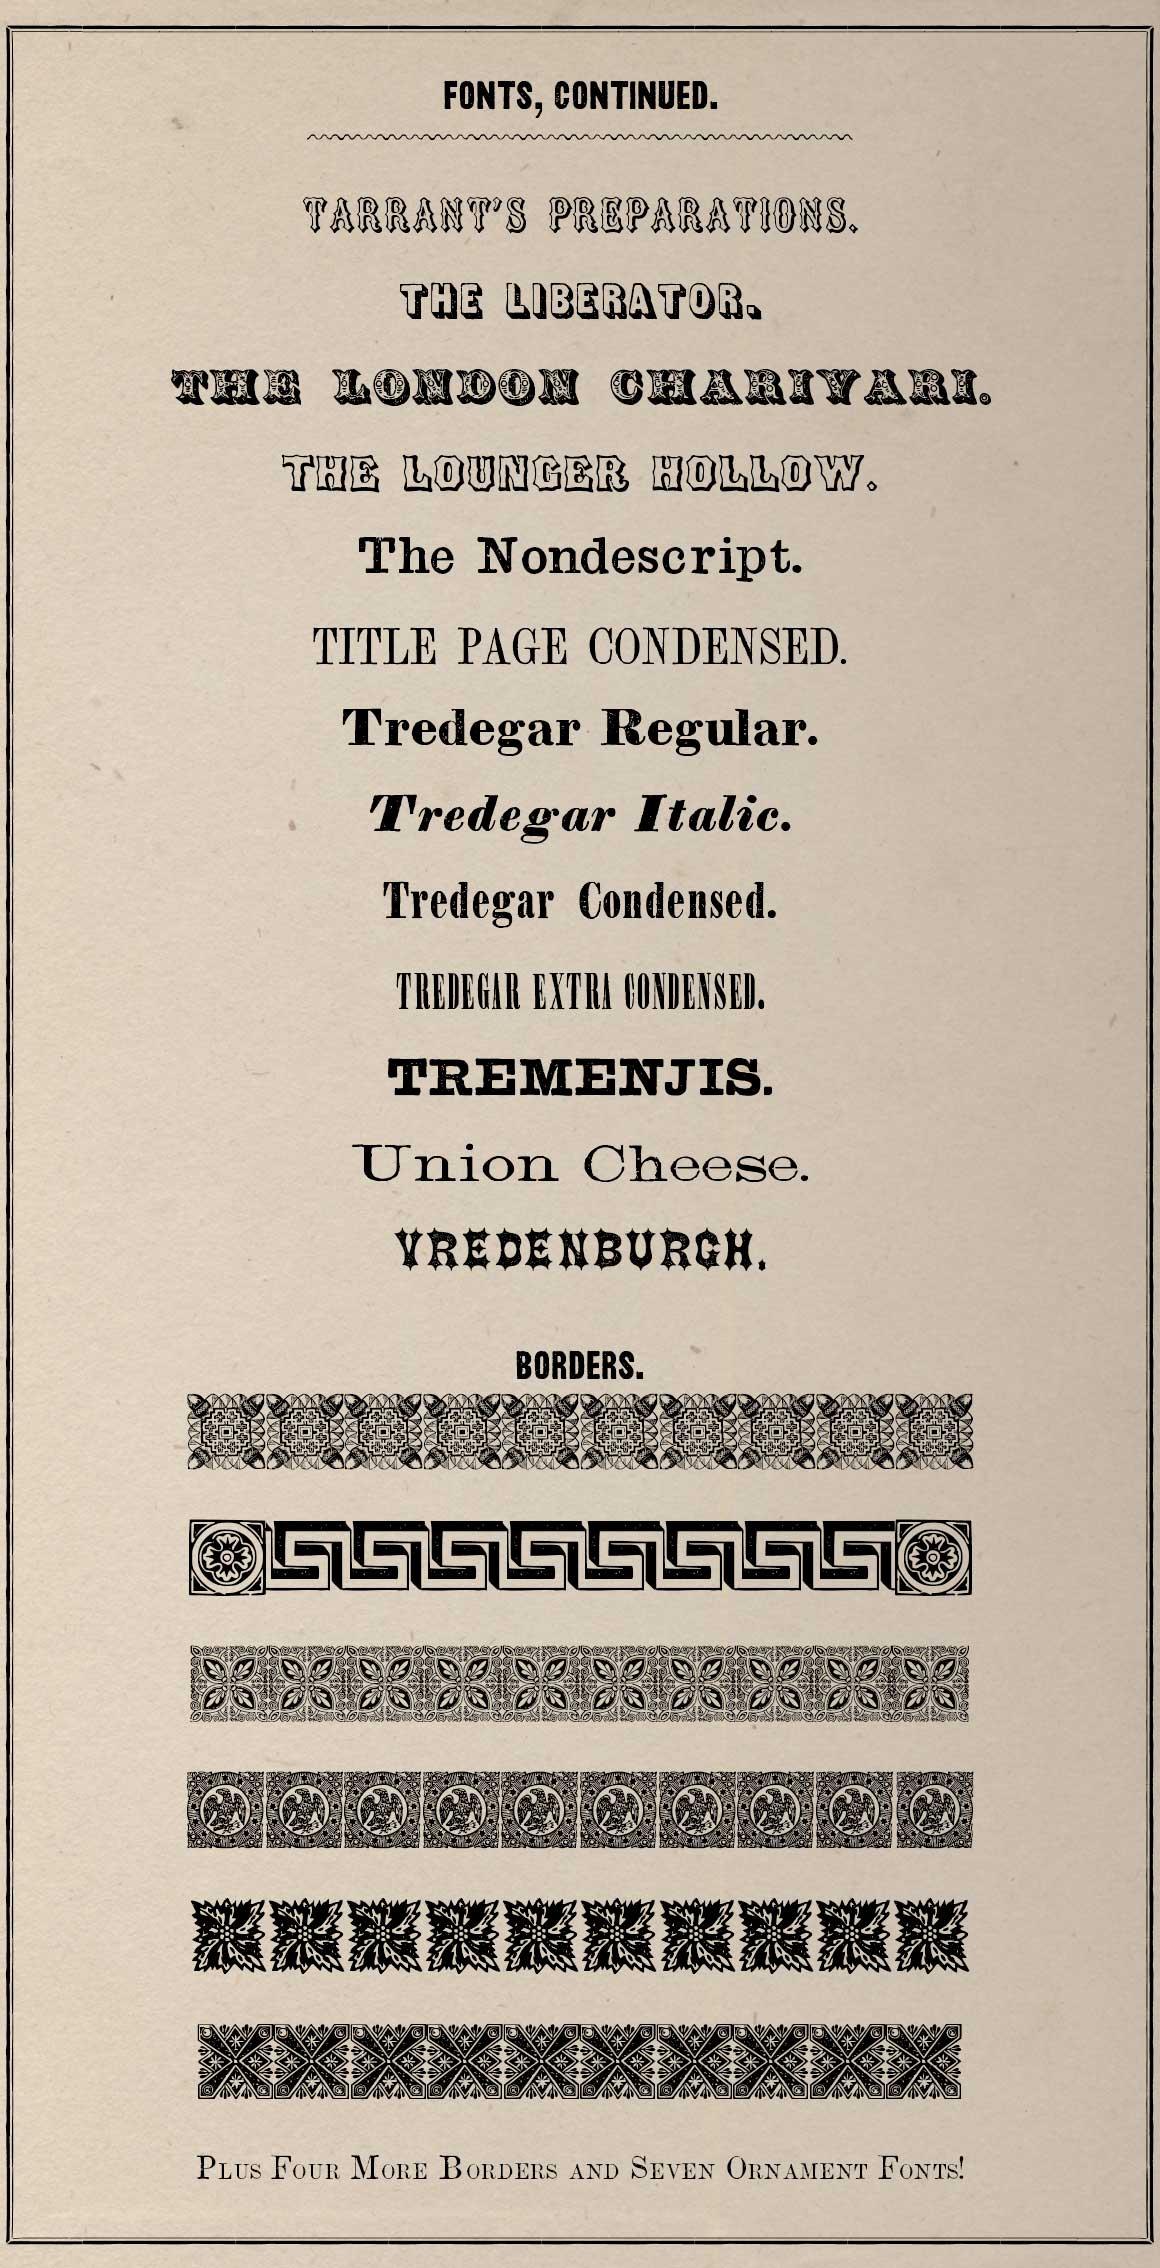 60 fonts from the civil war era